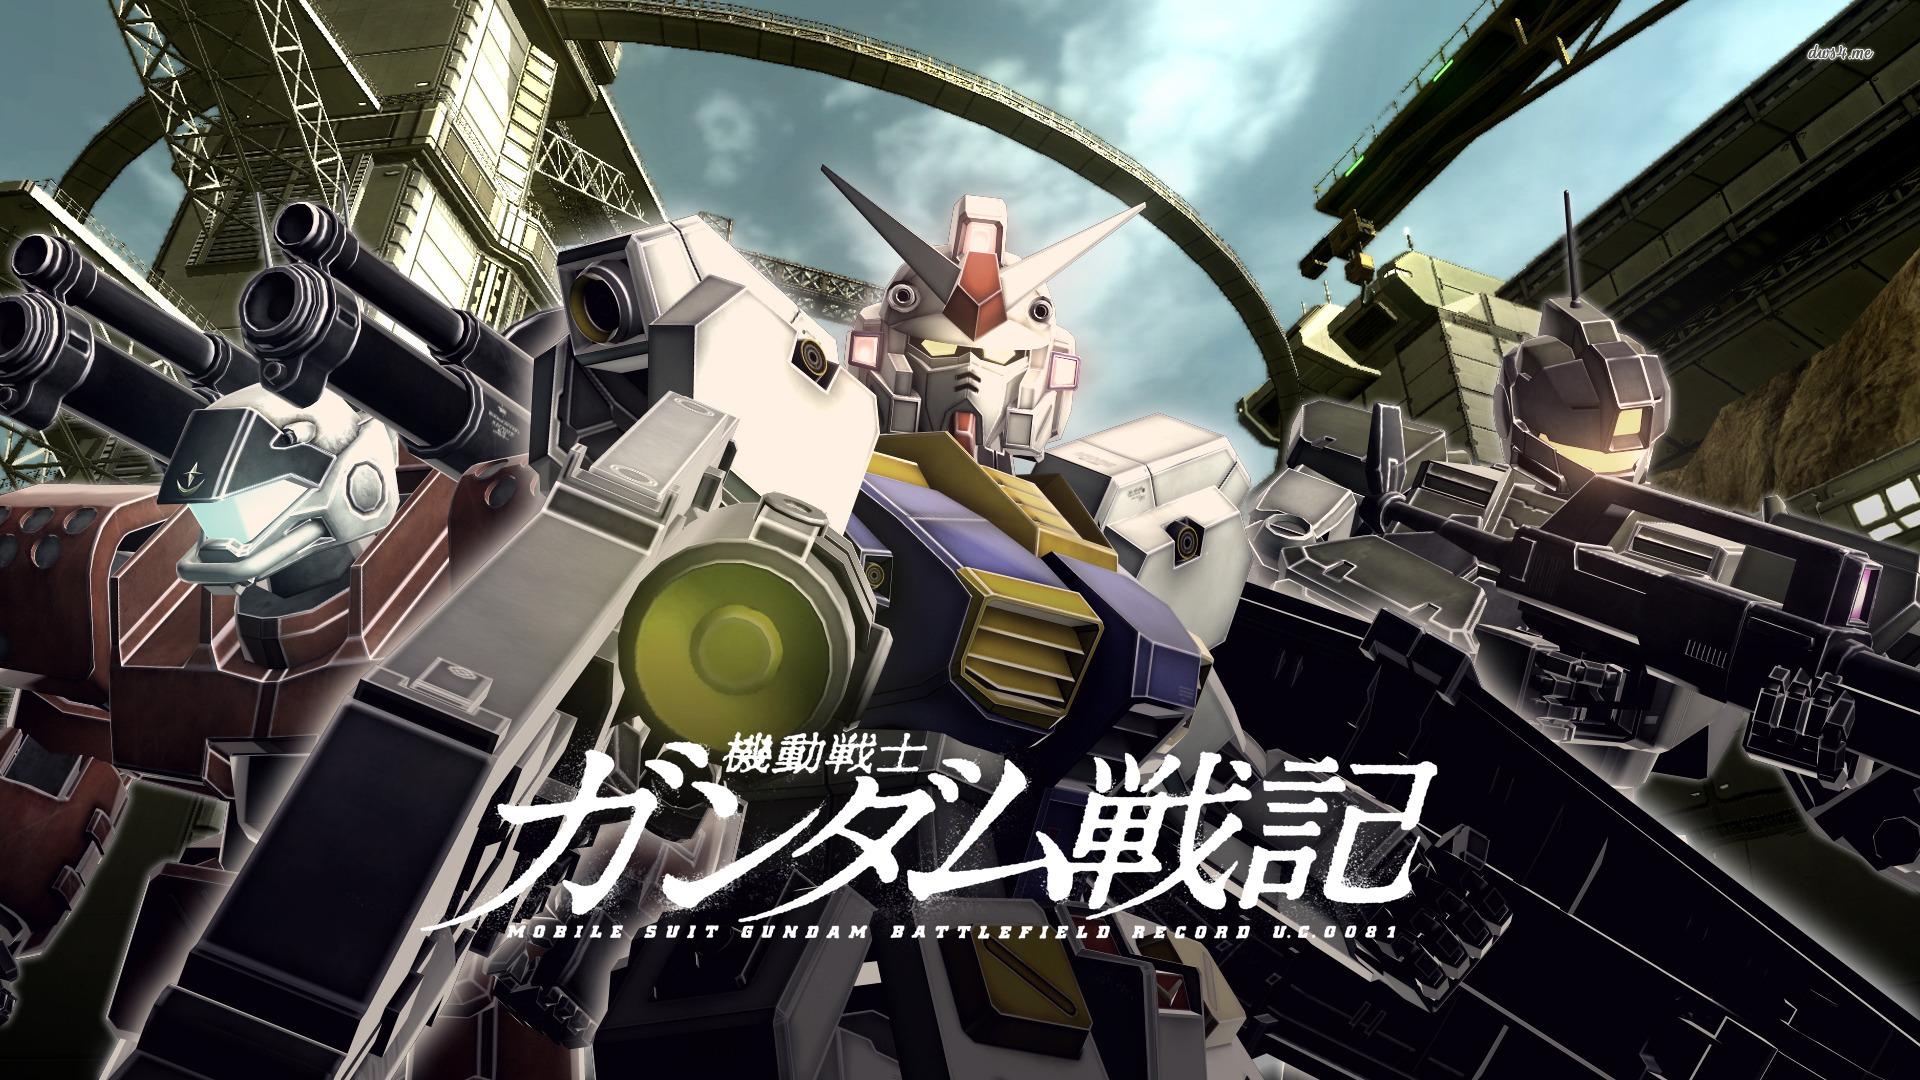 Mobile Suit Gundam wallpaper 1280x800 Mobile Suit Gundam wallpaper 1920x1080